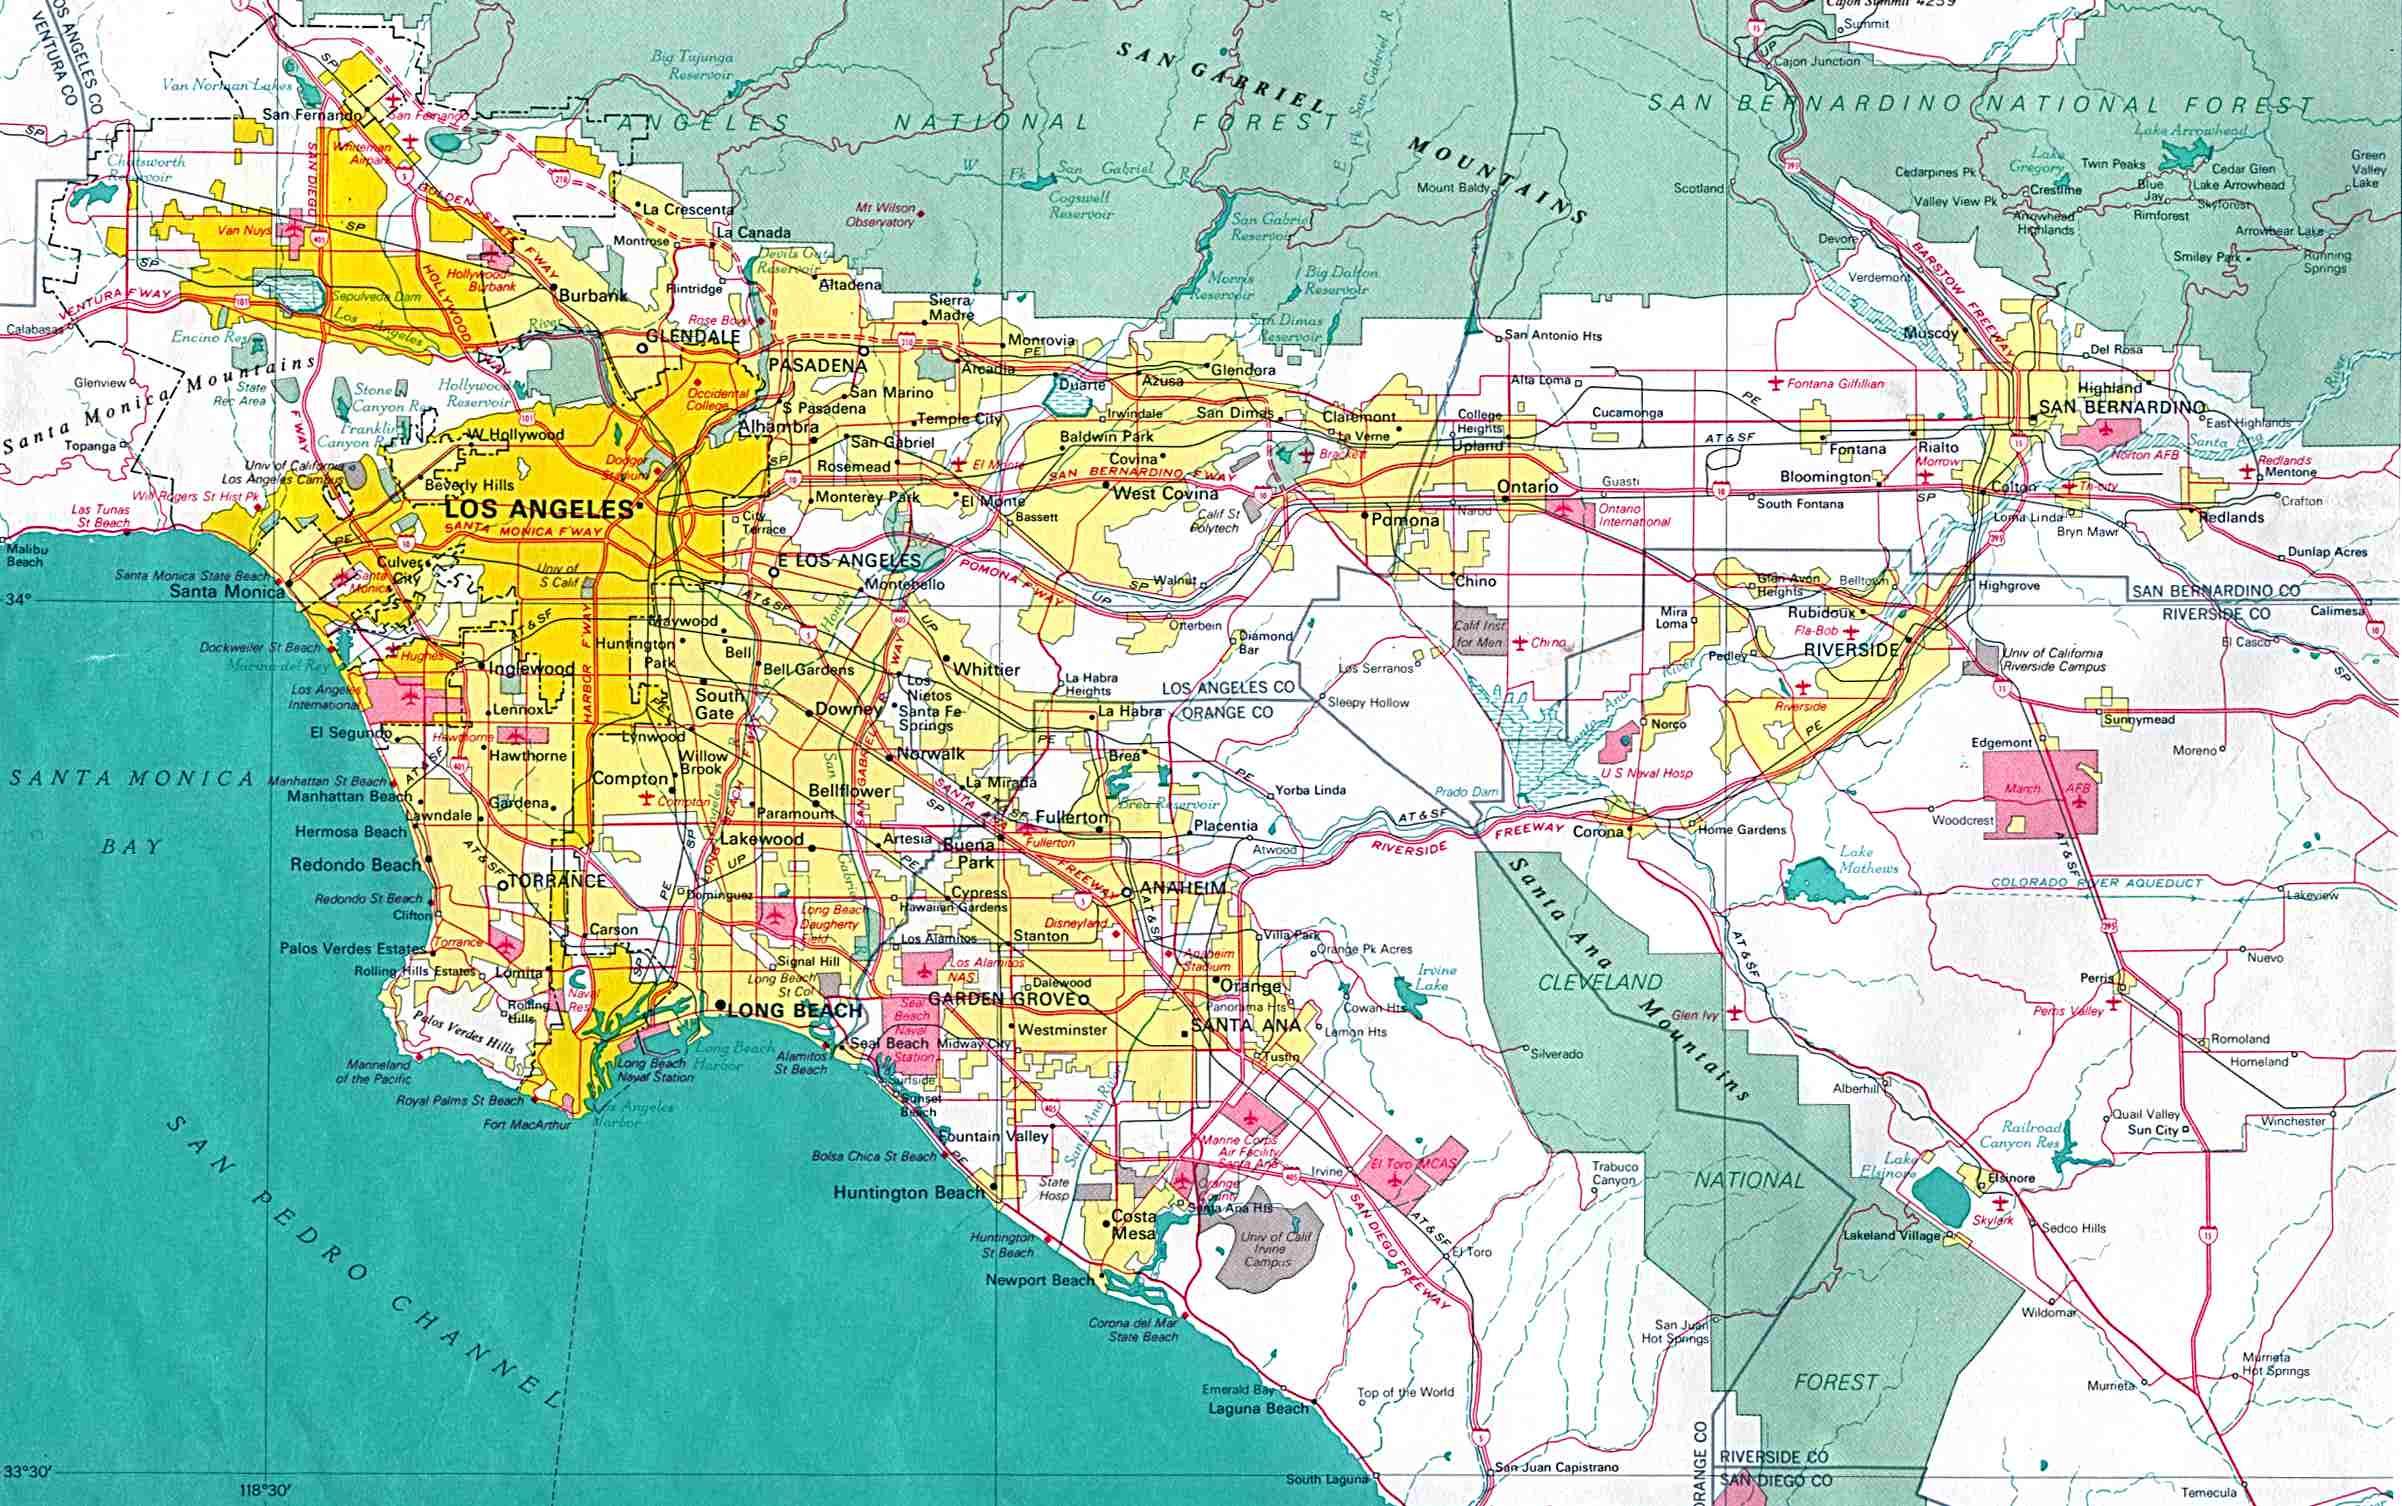 A Map Of Los Angeles California - Klipy - Los Angeles California Map